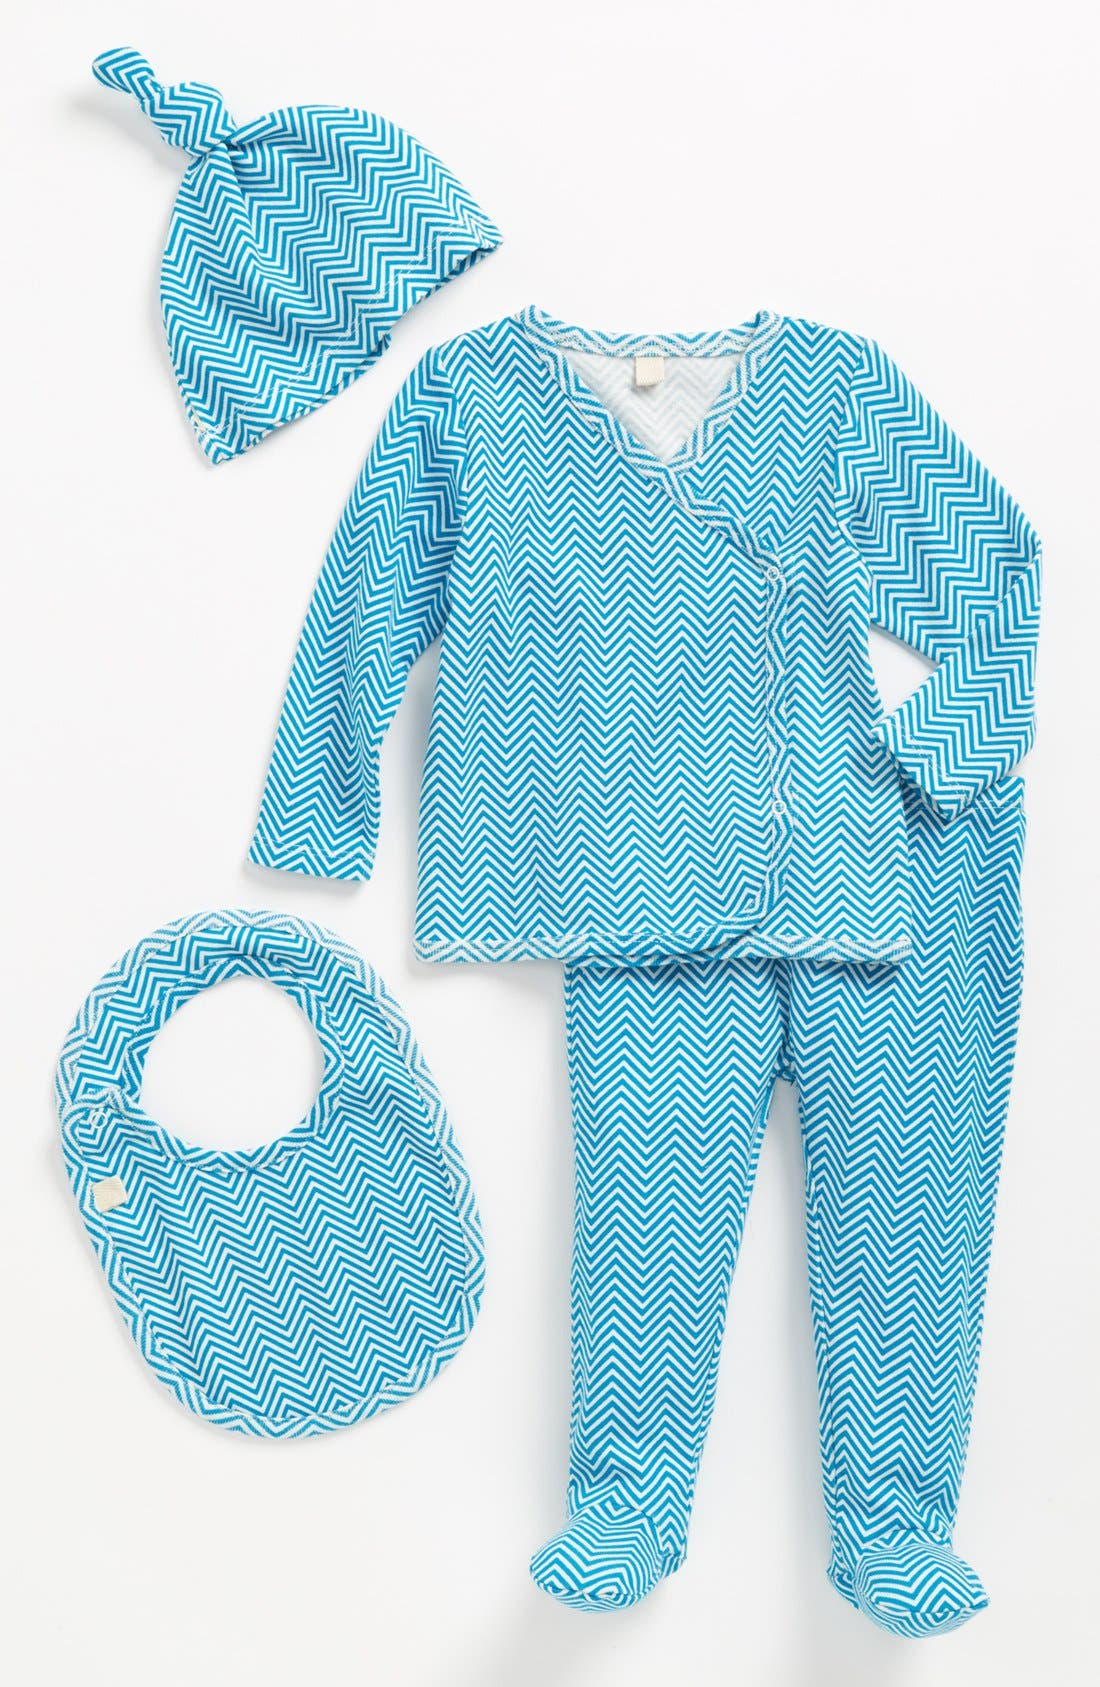 Alternate Image 1 Selected - Stem Baby Organic Cotton Chevron Print Shirt, Pants, Hat & Bib (Baby Boys)